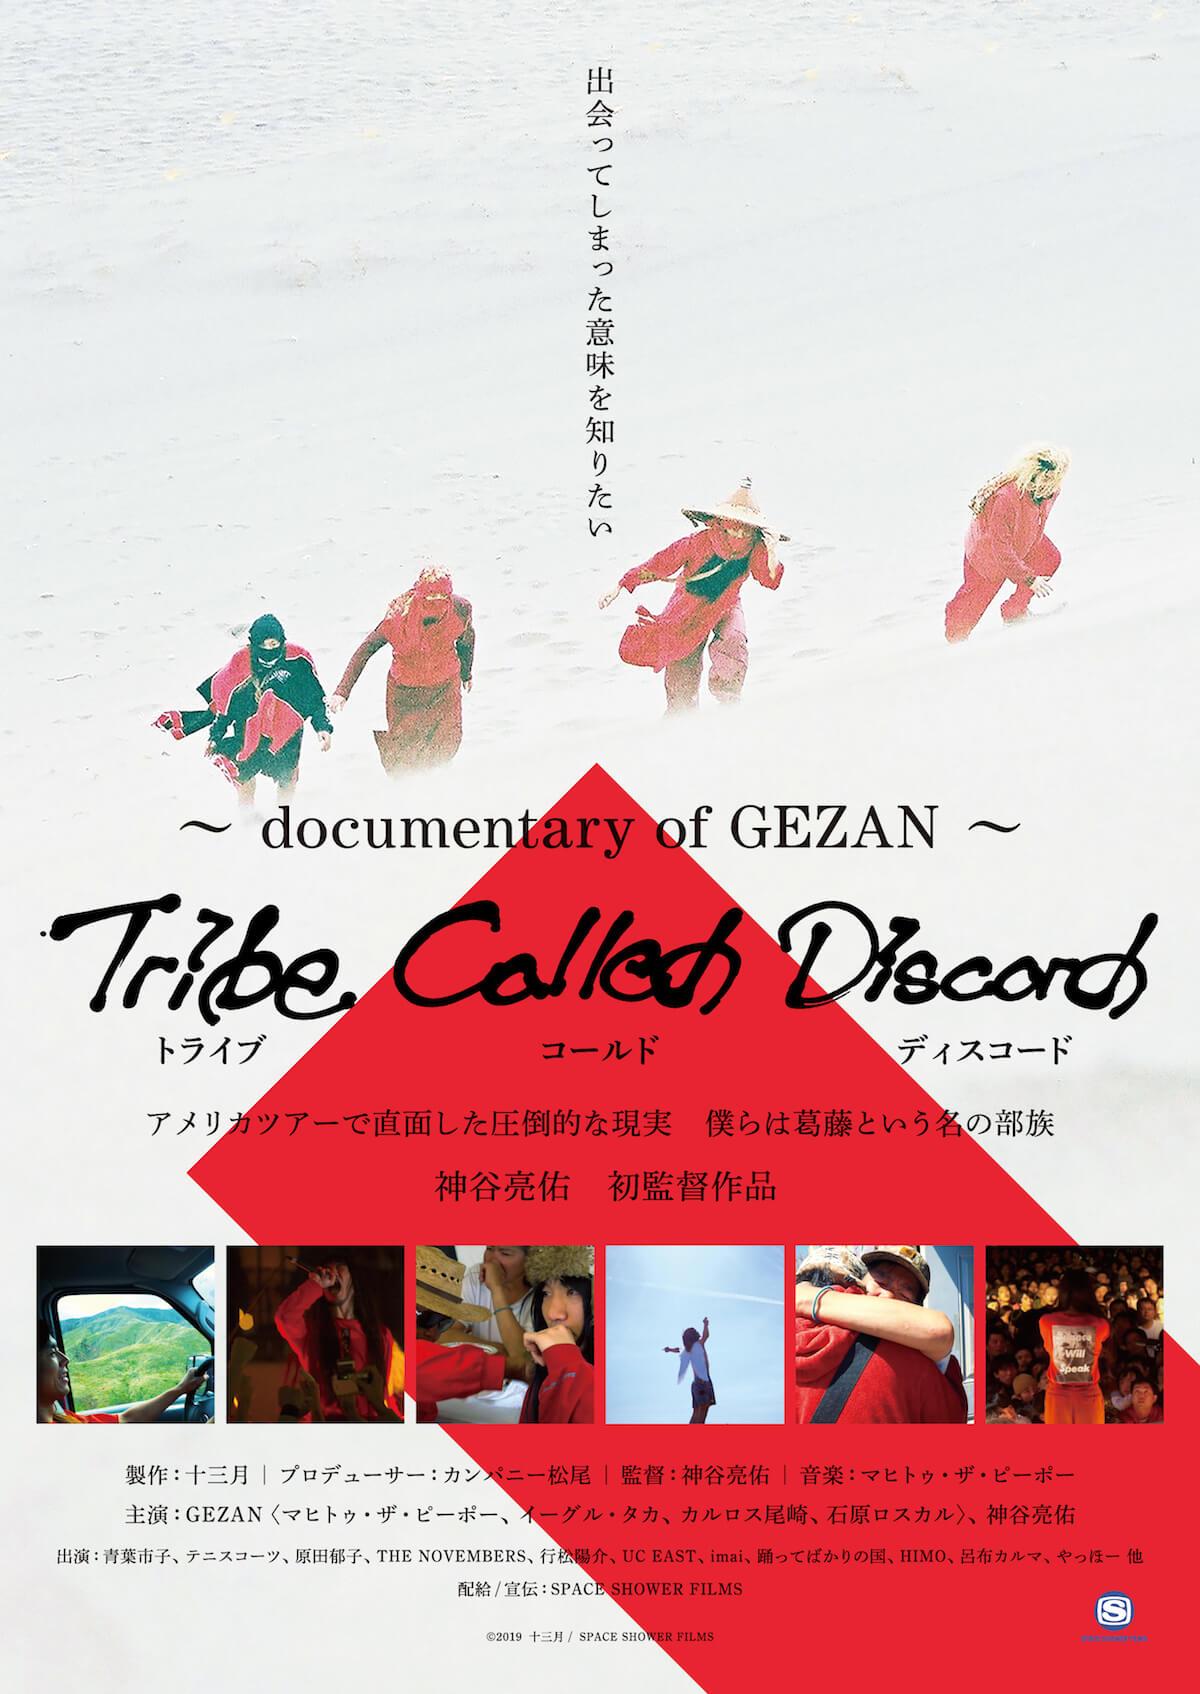 『Tribe Called Discord:Documentary of GEZAN』待望の劇場予告編がついに本日解禁 film190510_gezan_1